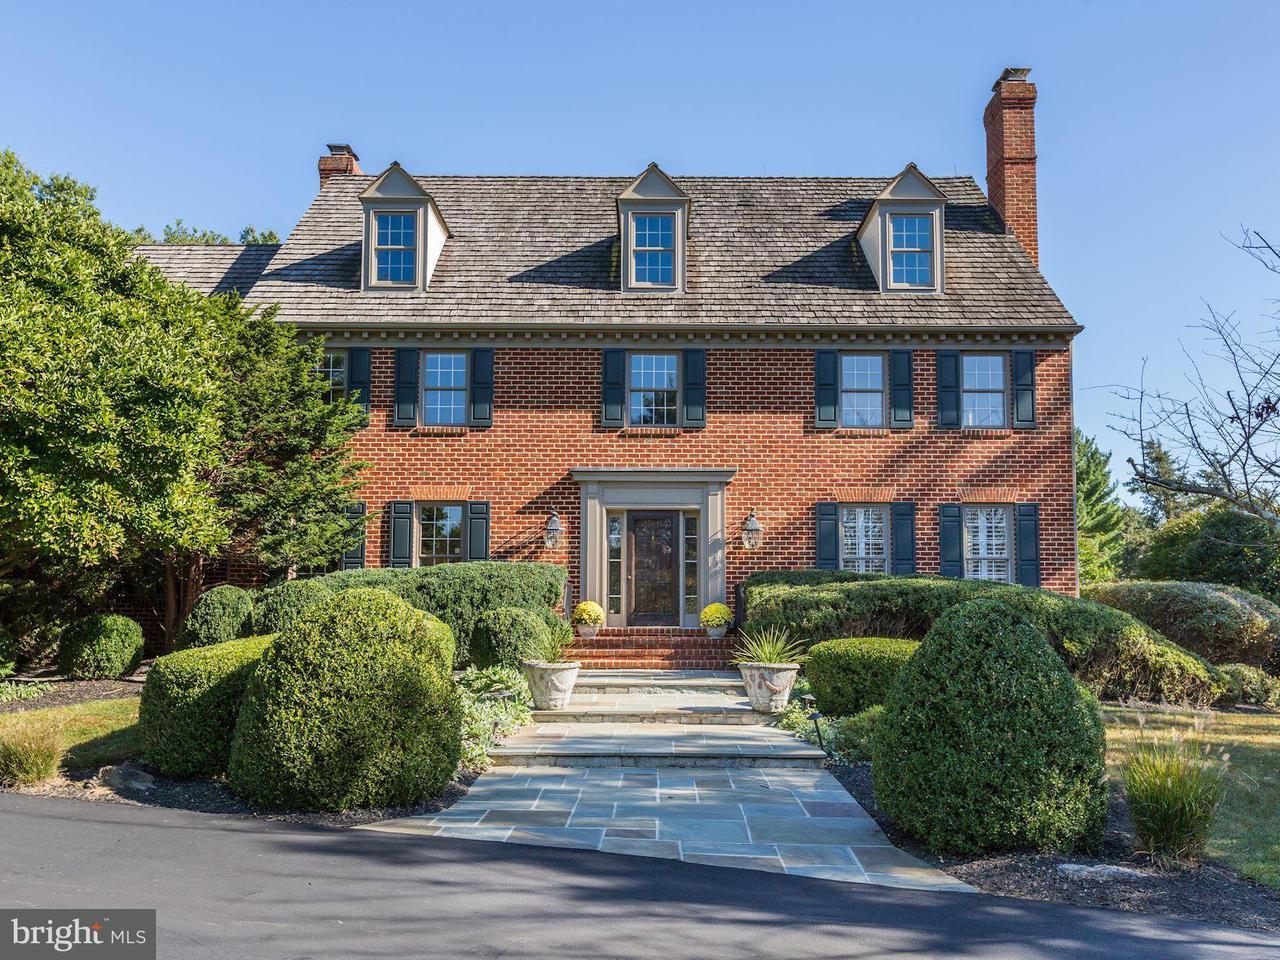 獨棟家庭住宅 為 出售 在 13601 STONEBARN Lane 13601 STONEBARN Lane North Potomac, 馬里蘭州 20878 美國